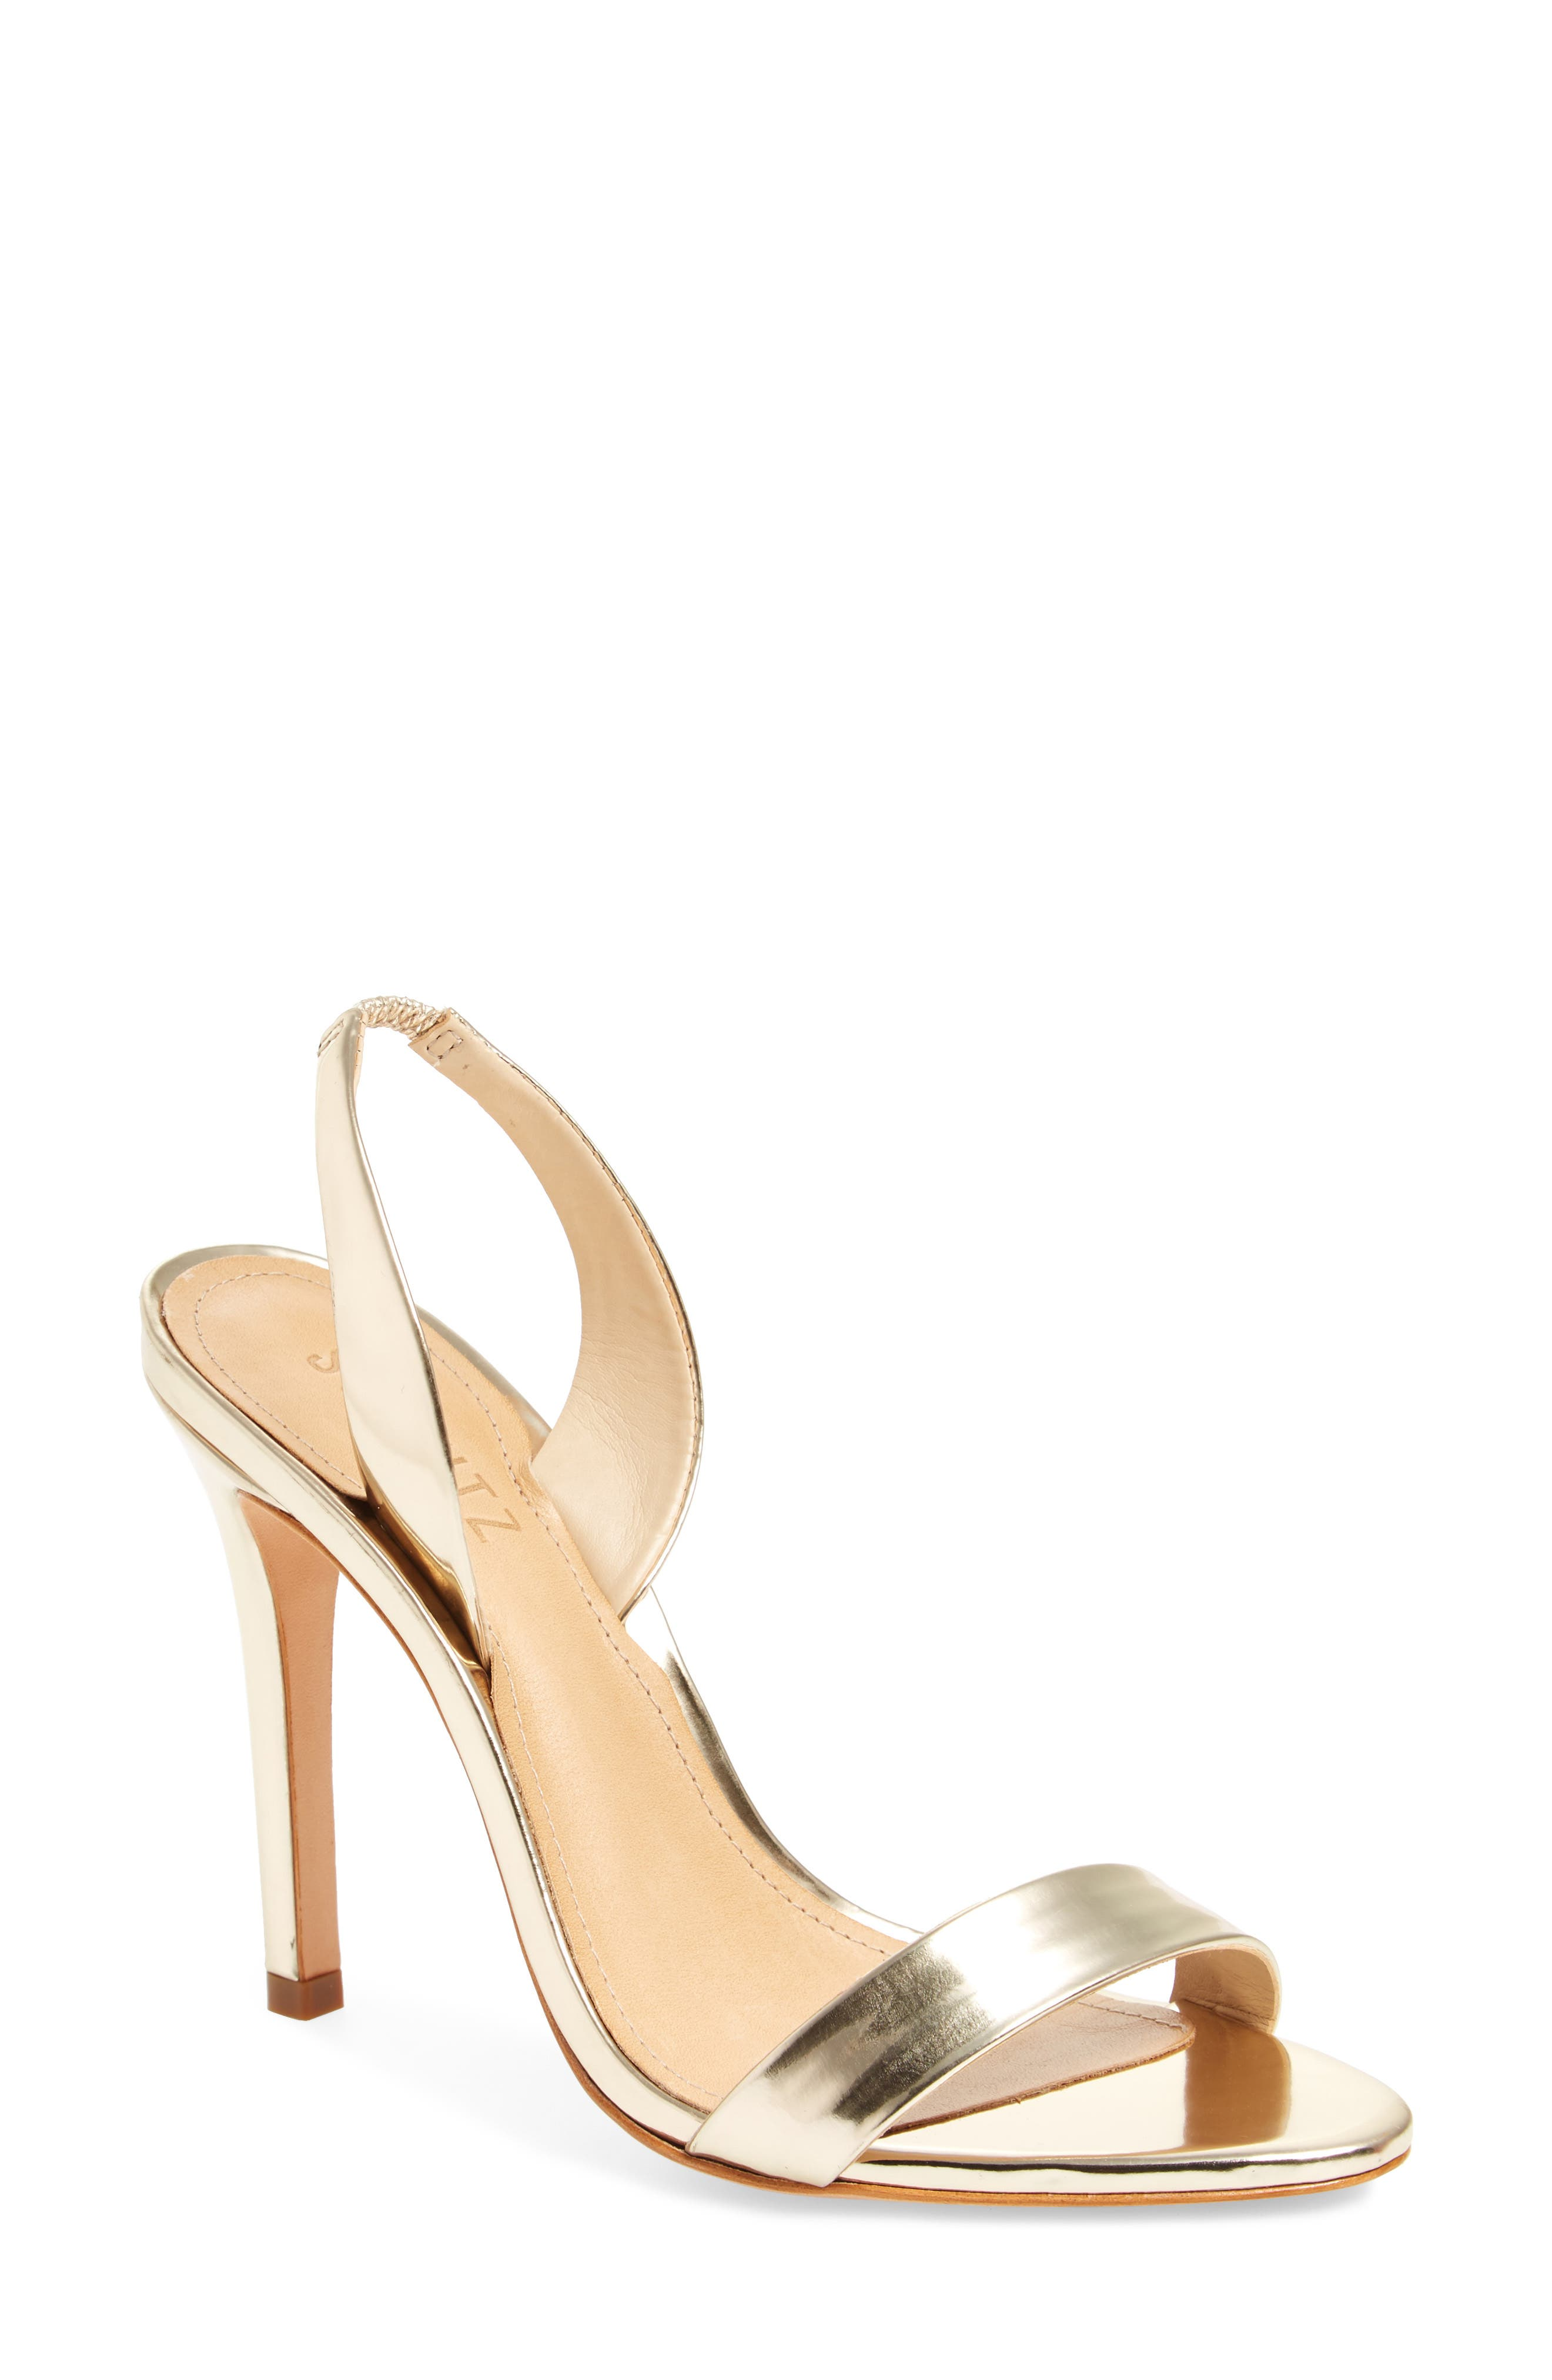 Main Image - Schutz Luriane Sandal (Women)